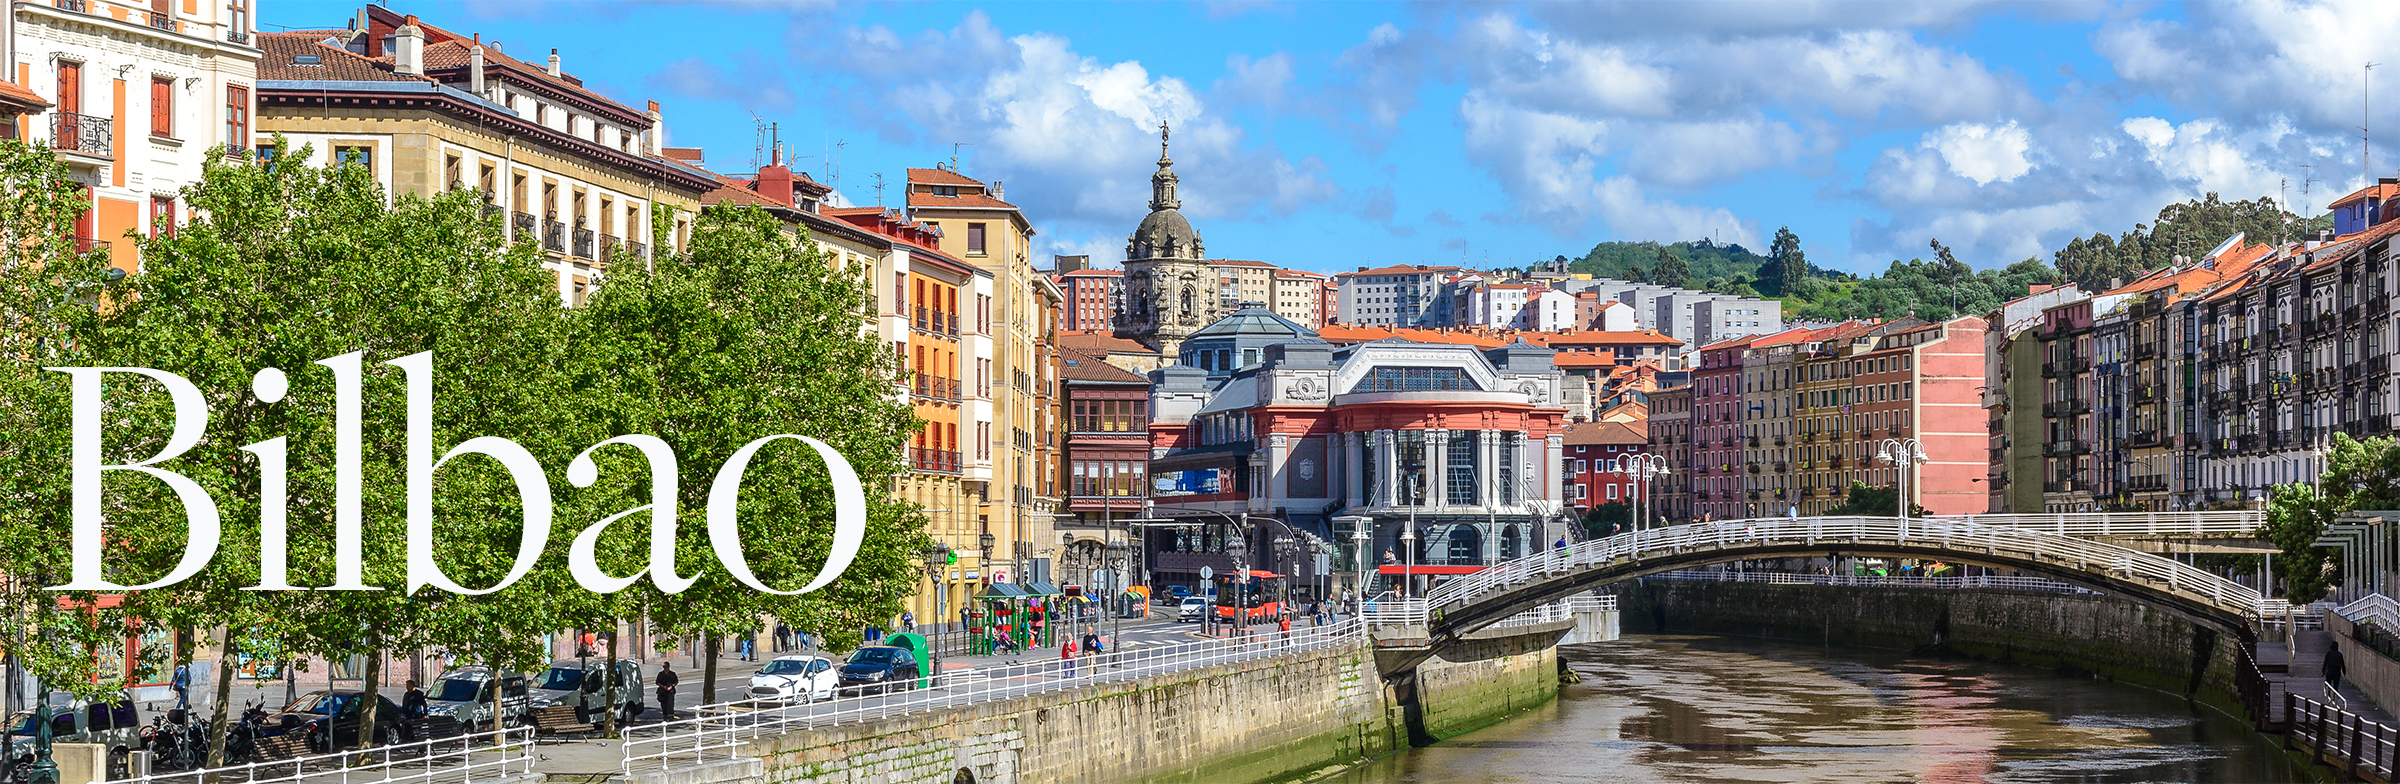 Bilbao Banner.jpg